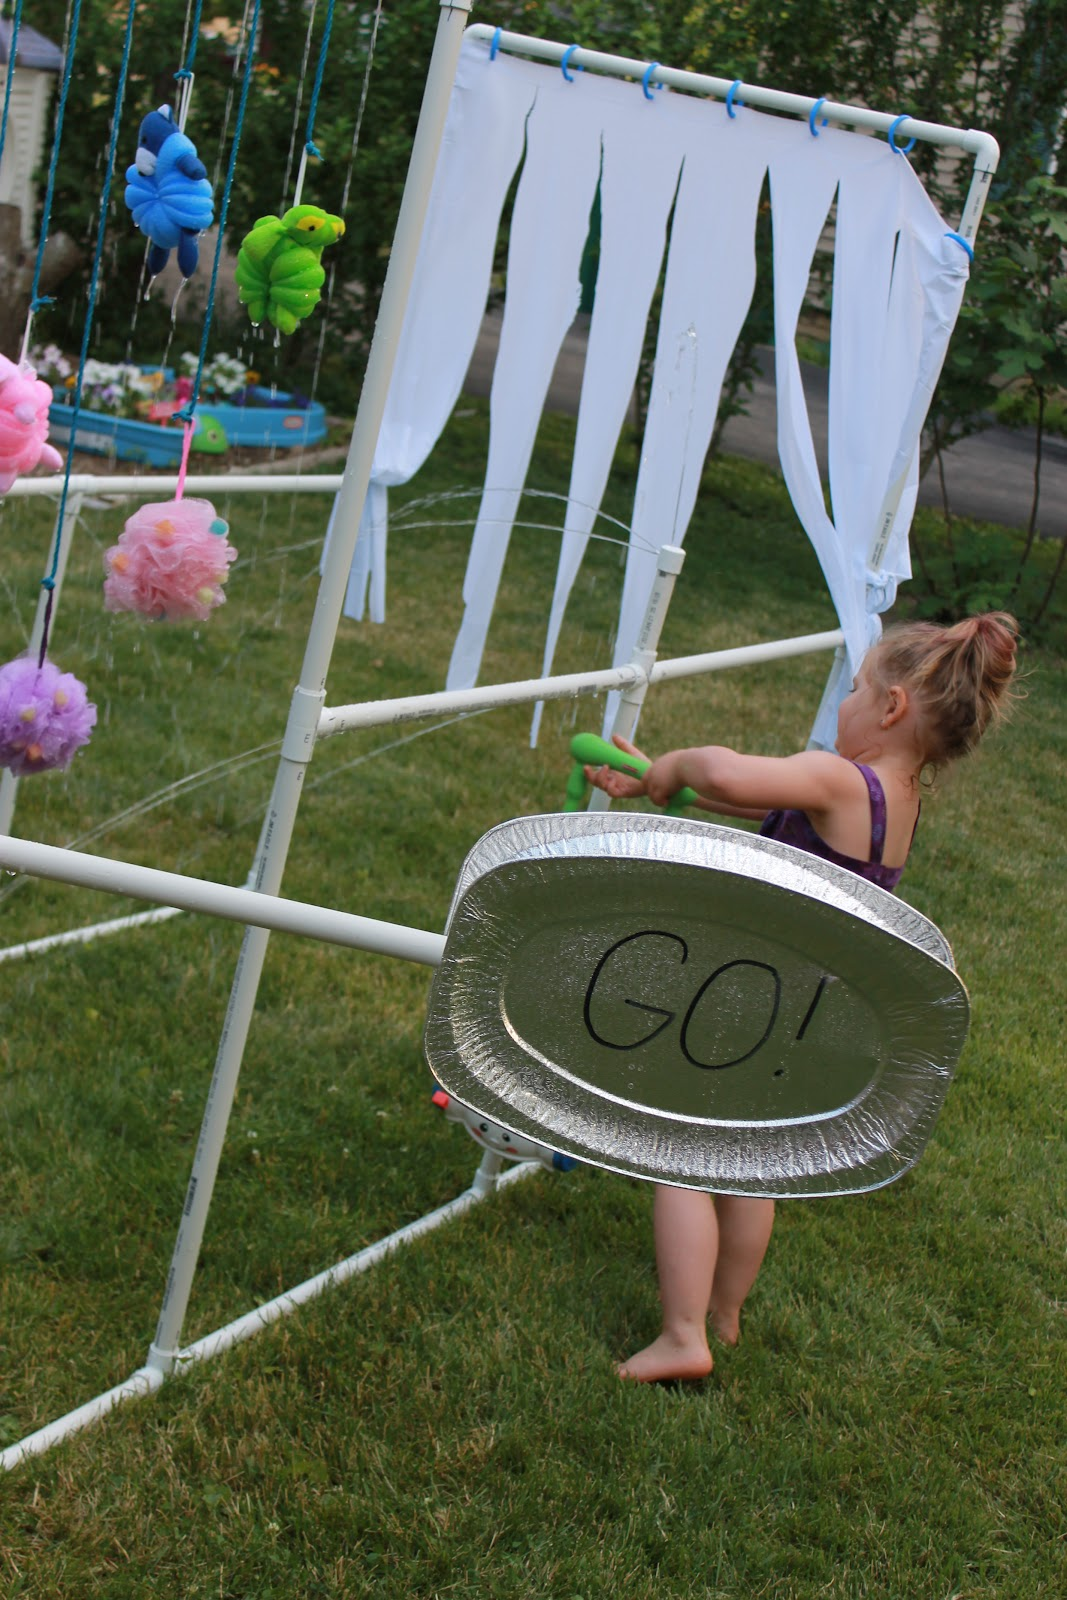 Diy Deluxe Kid Wash Sprinkler For 40 The Mom Standard